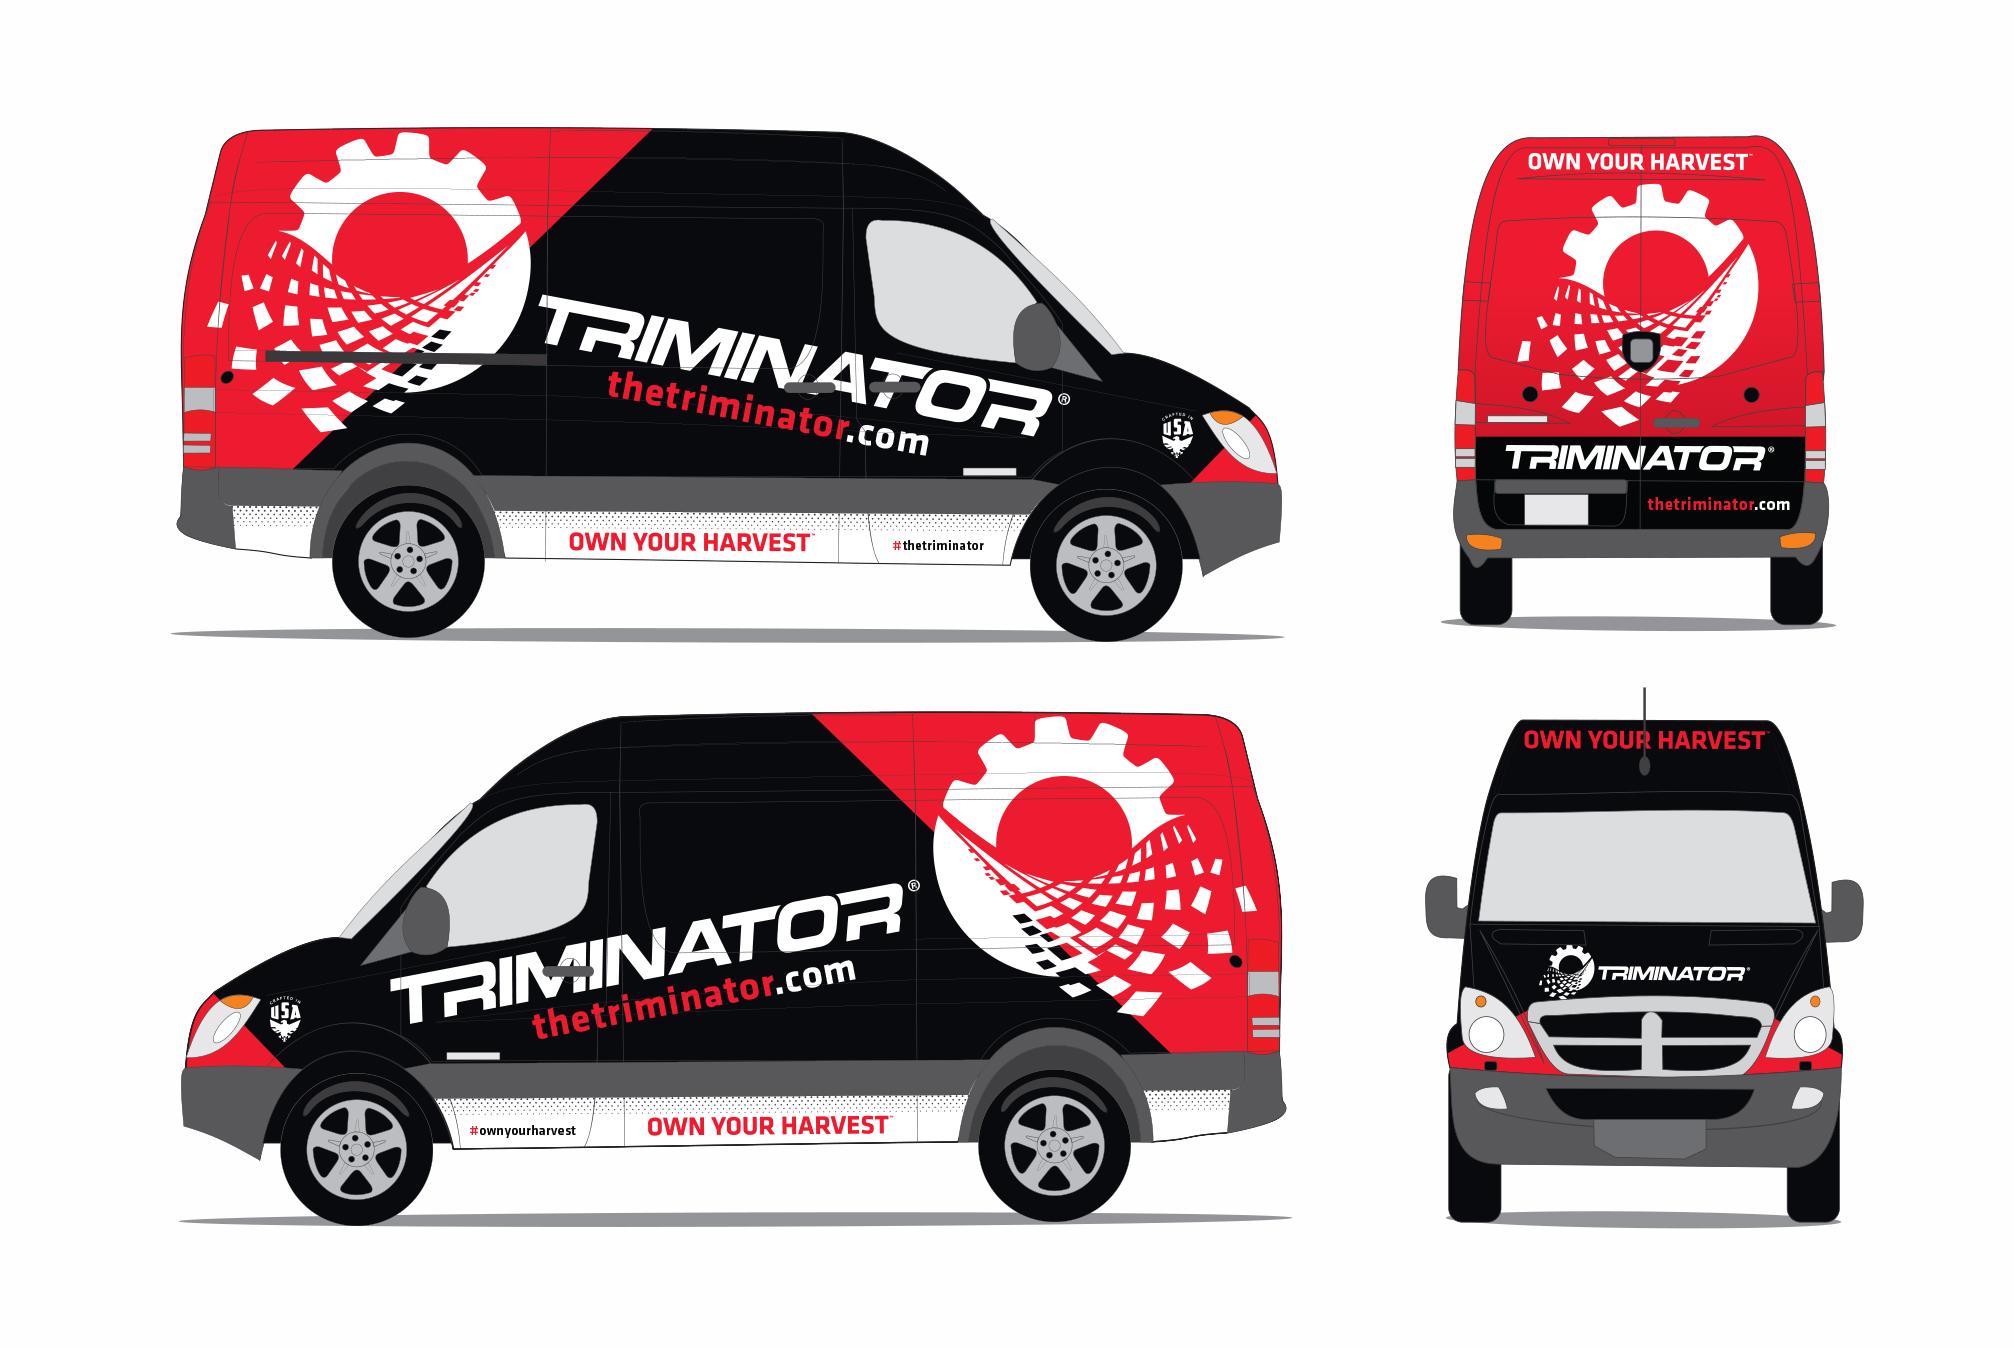 triminator-vehicle-design.jpg